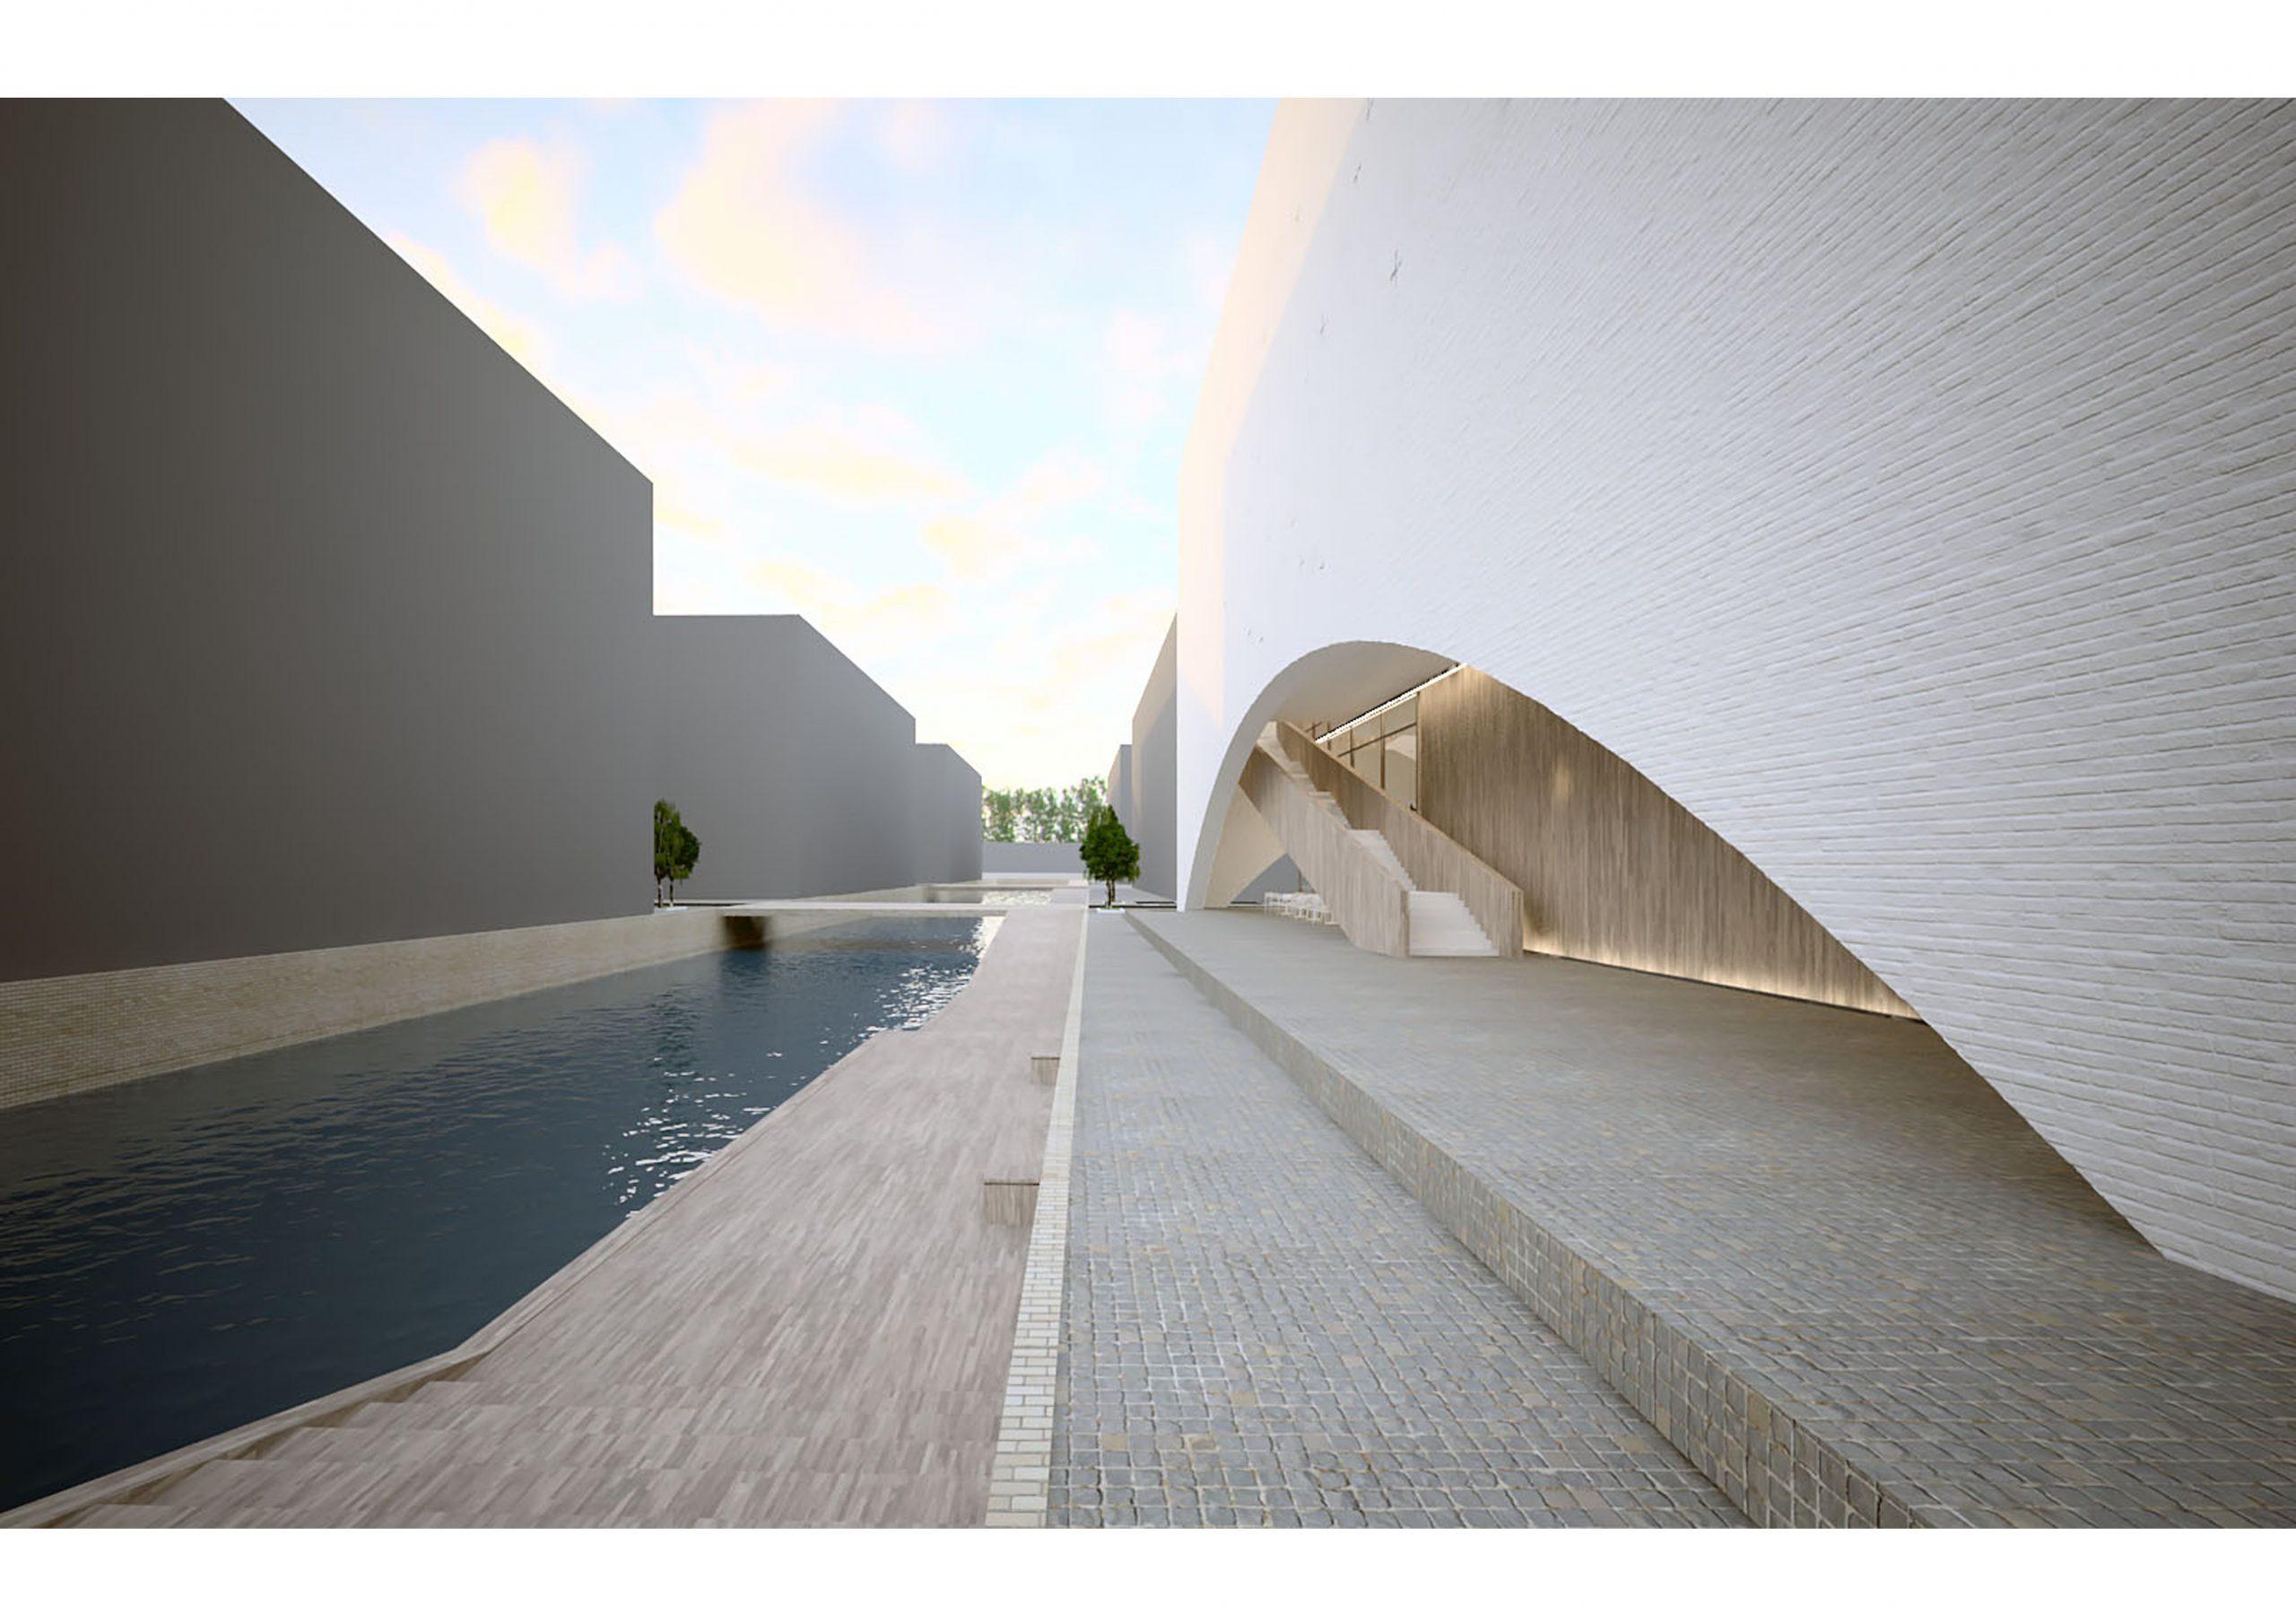 https://nbc-arhitect.ro/wp-content/uploads/2020/10/NBC-Arhitect-_-public-buildings-_-Protestant-Church-_-Copenhagen-_-exterior-view_6-scaled.jpg